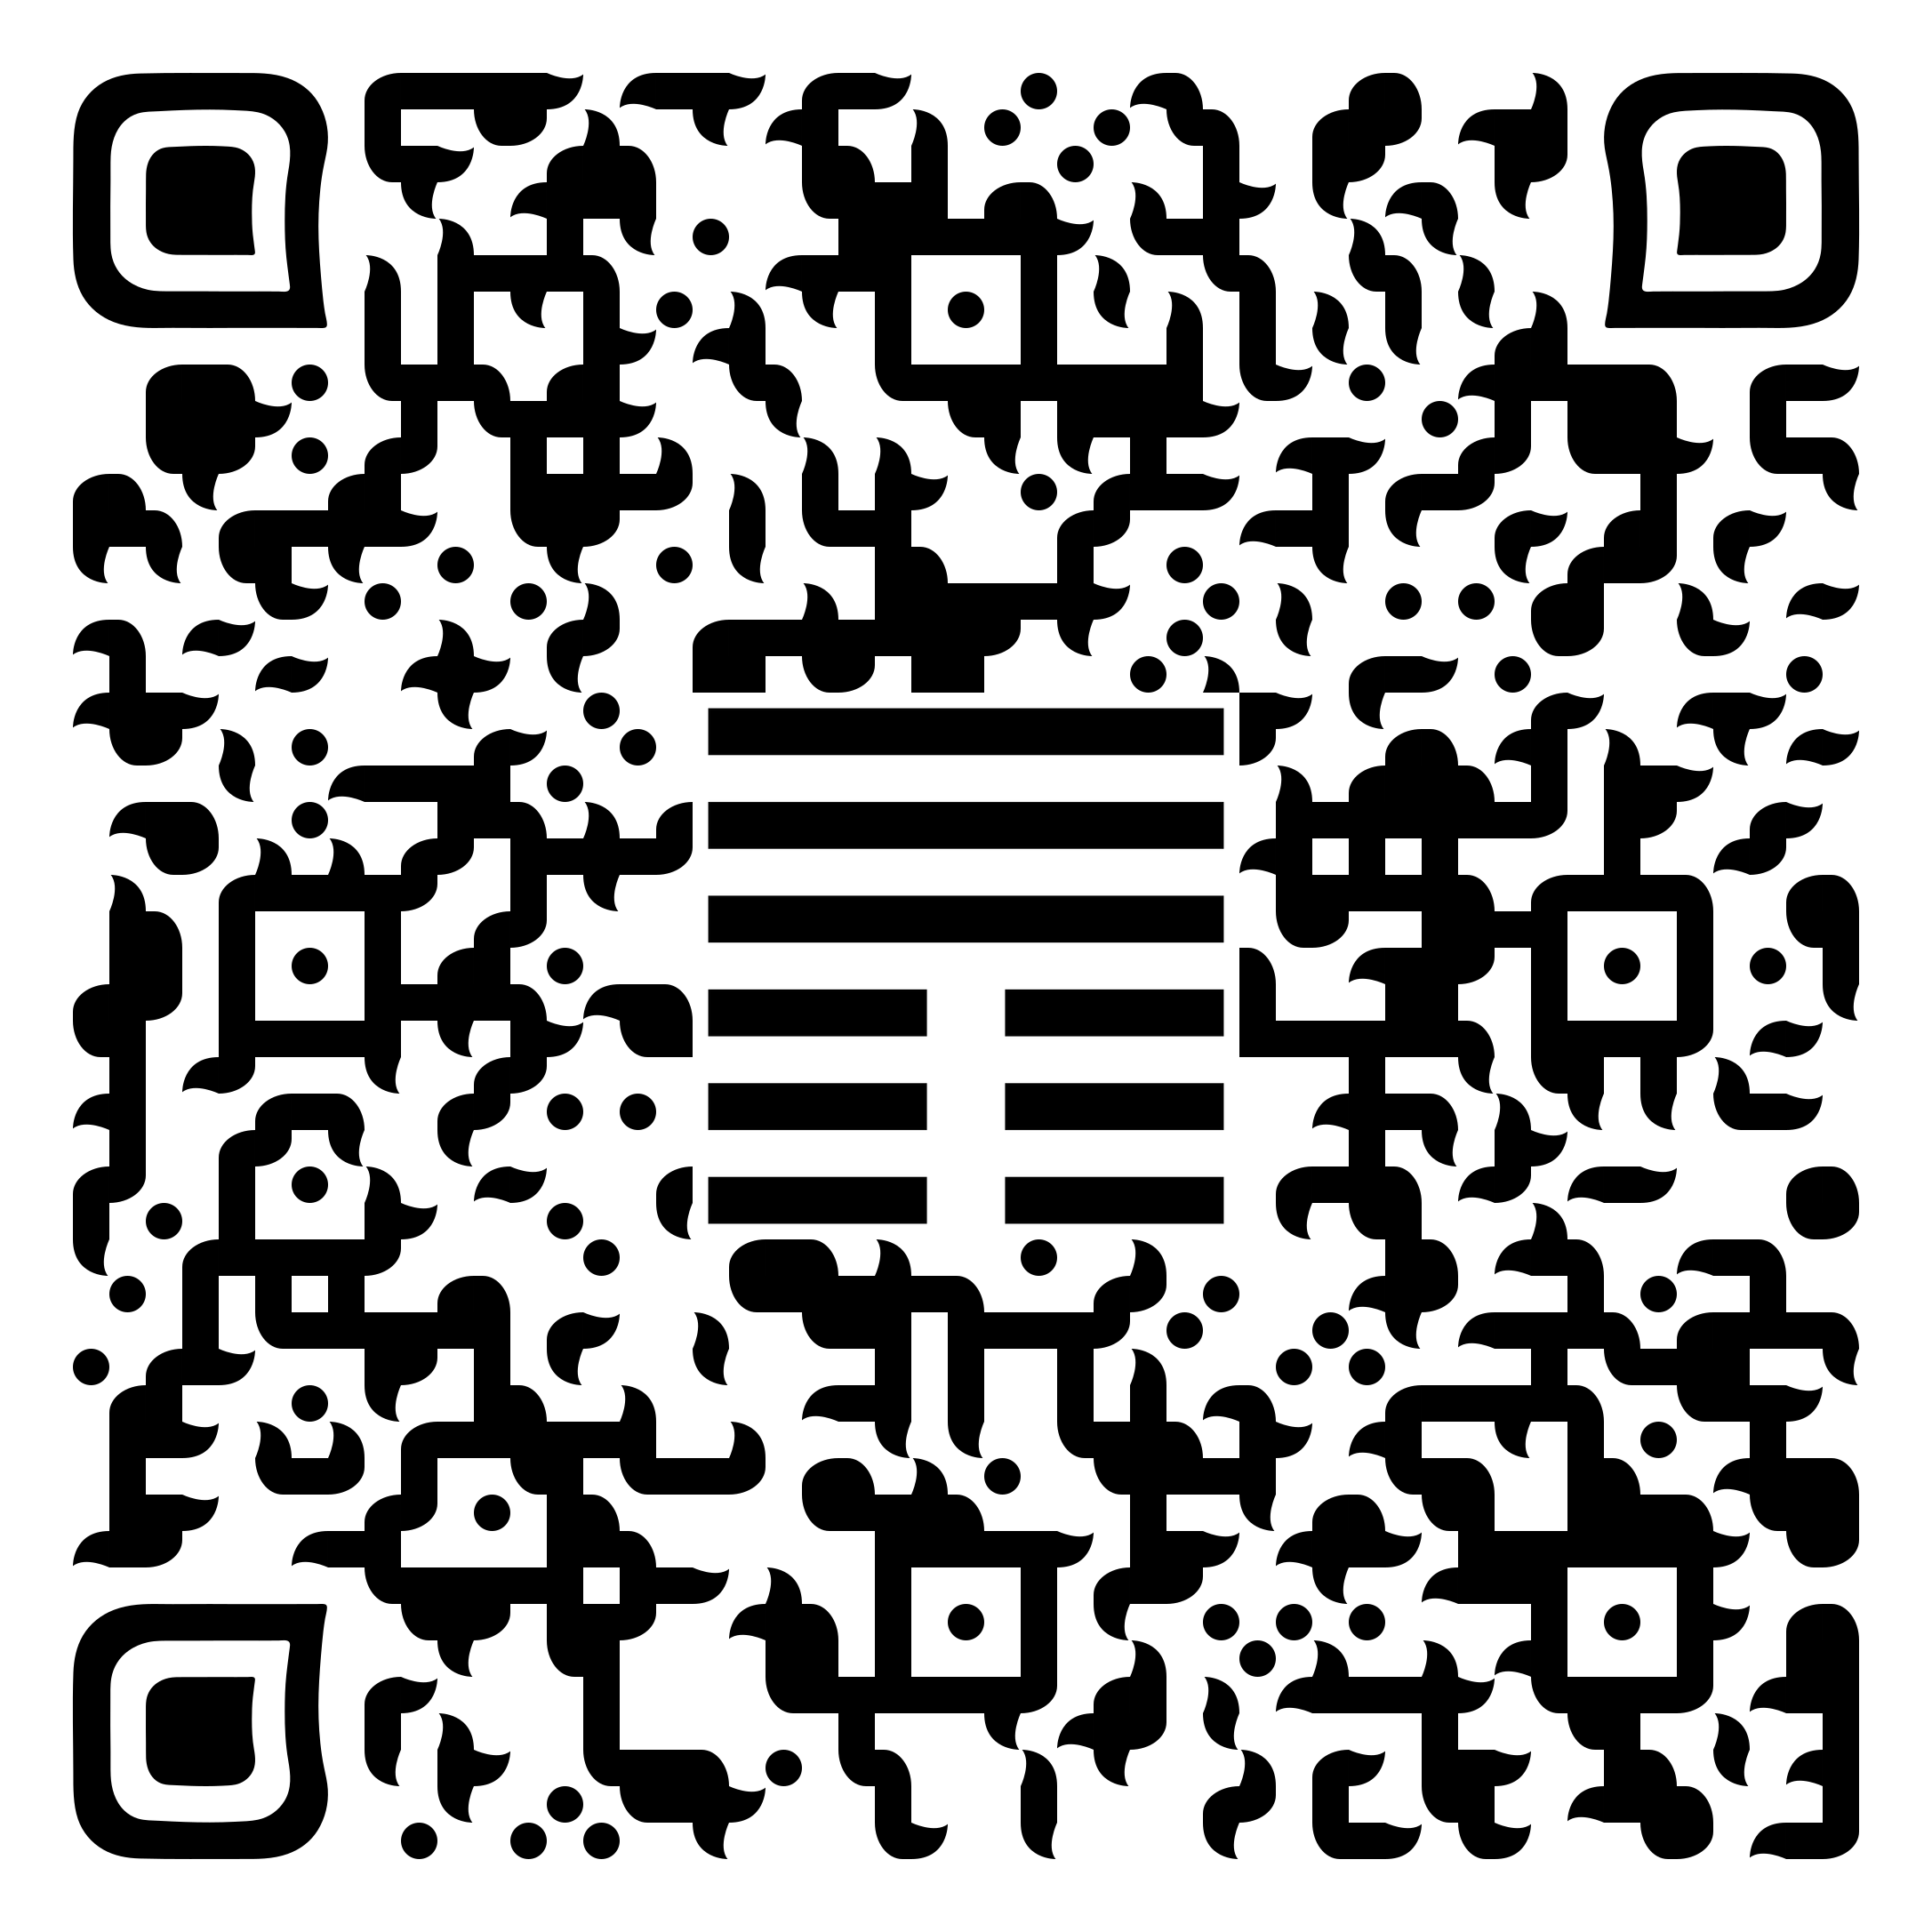 qr-code-12.png